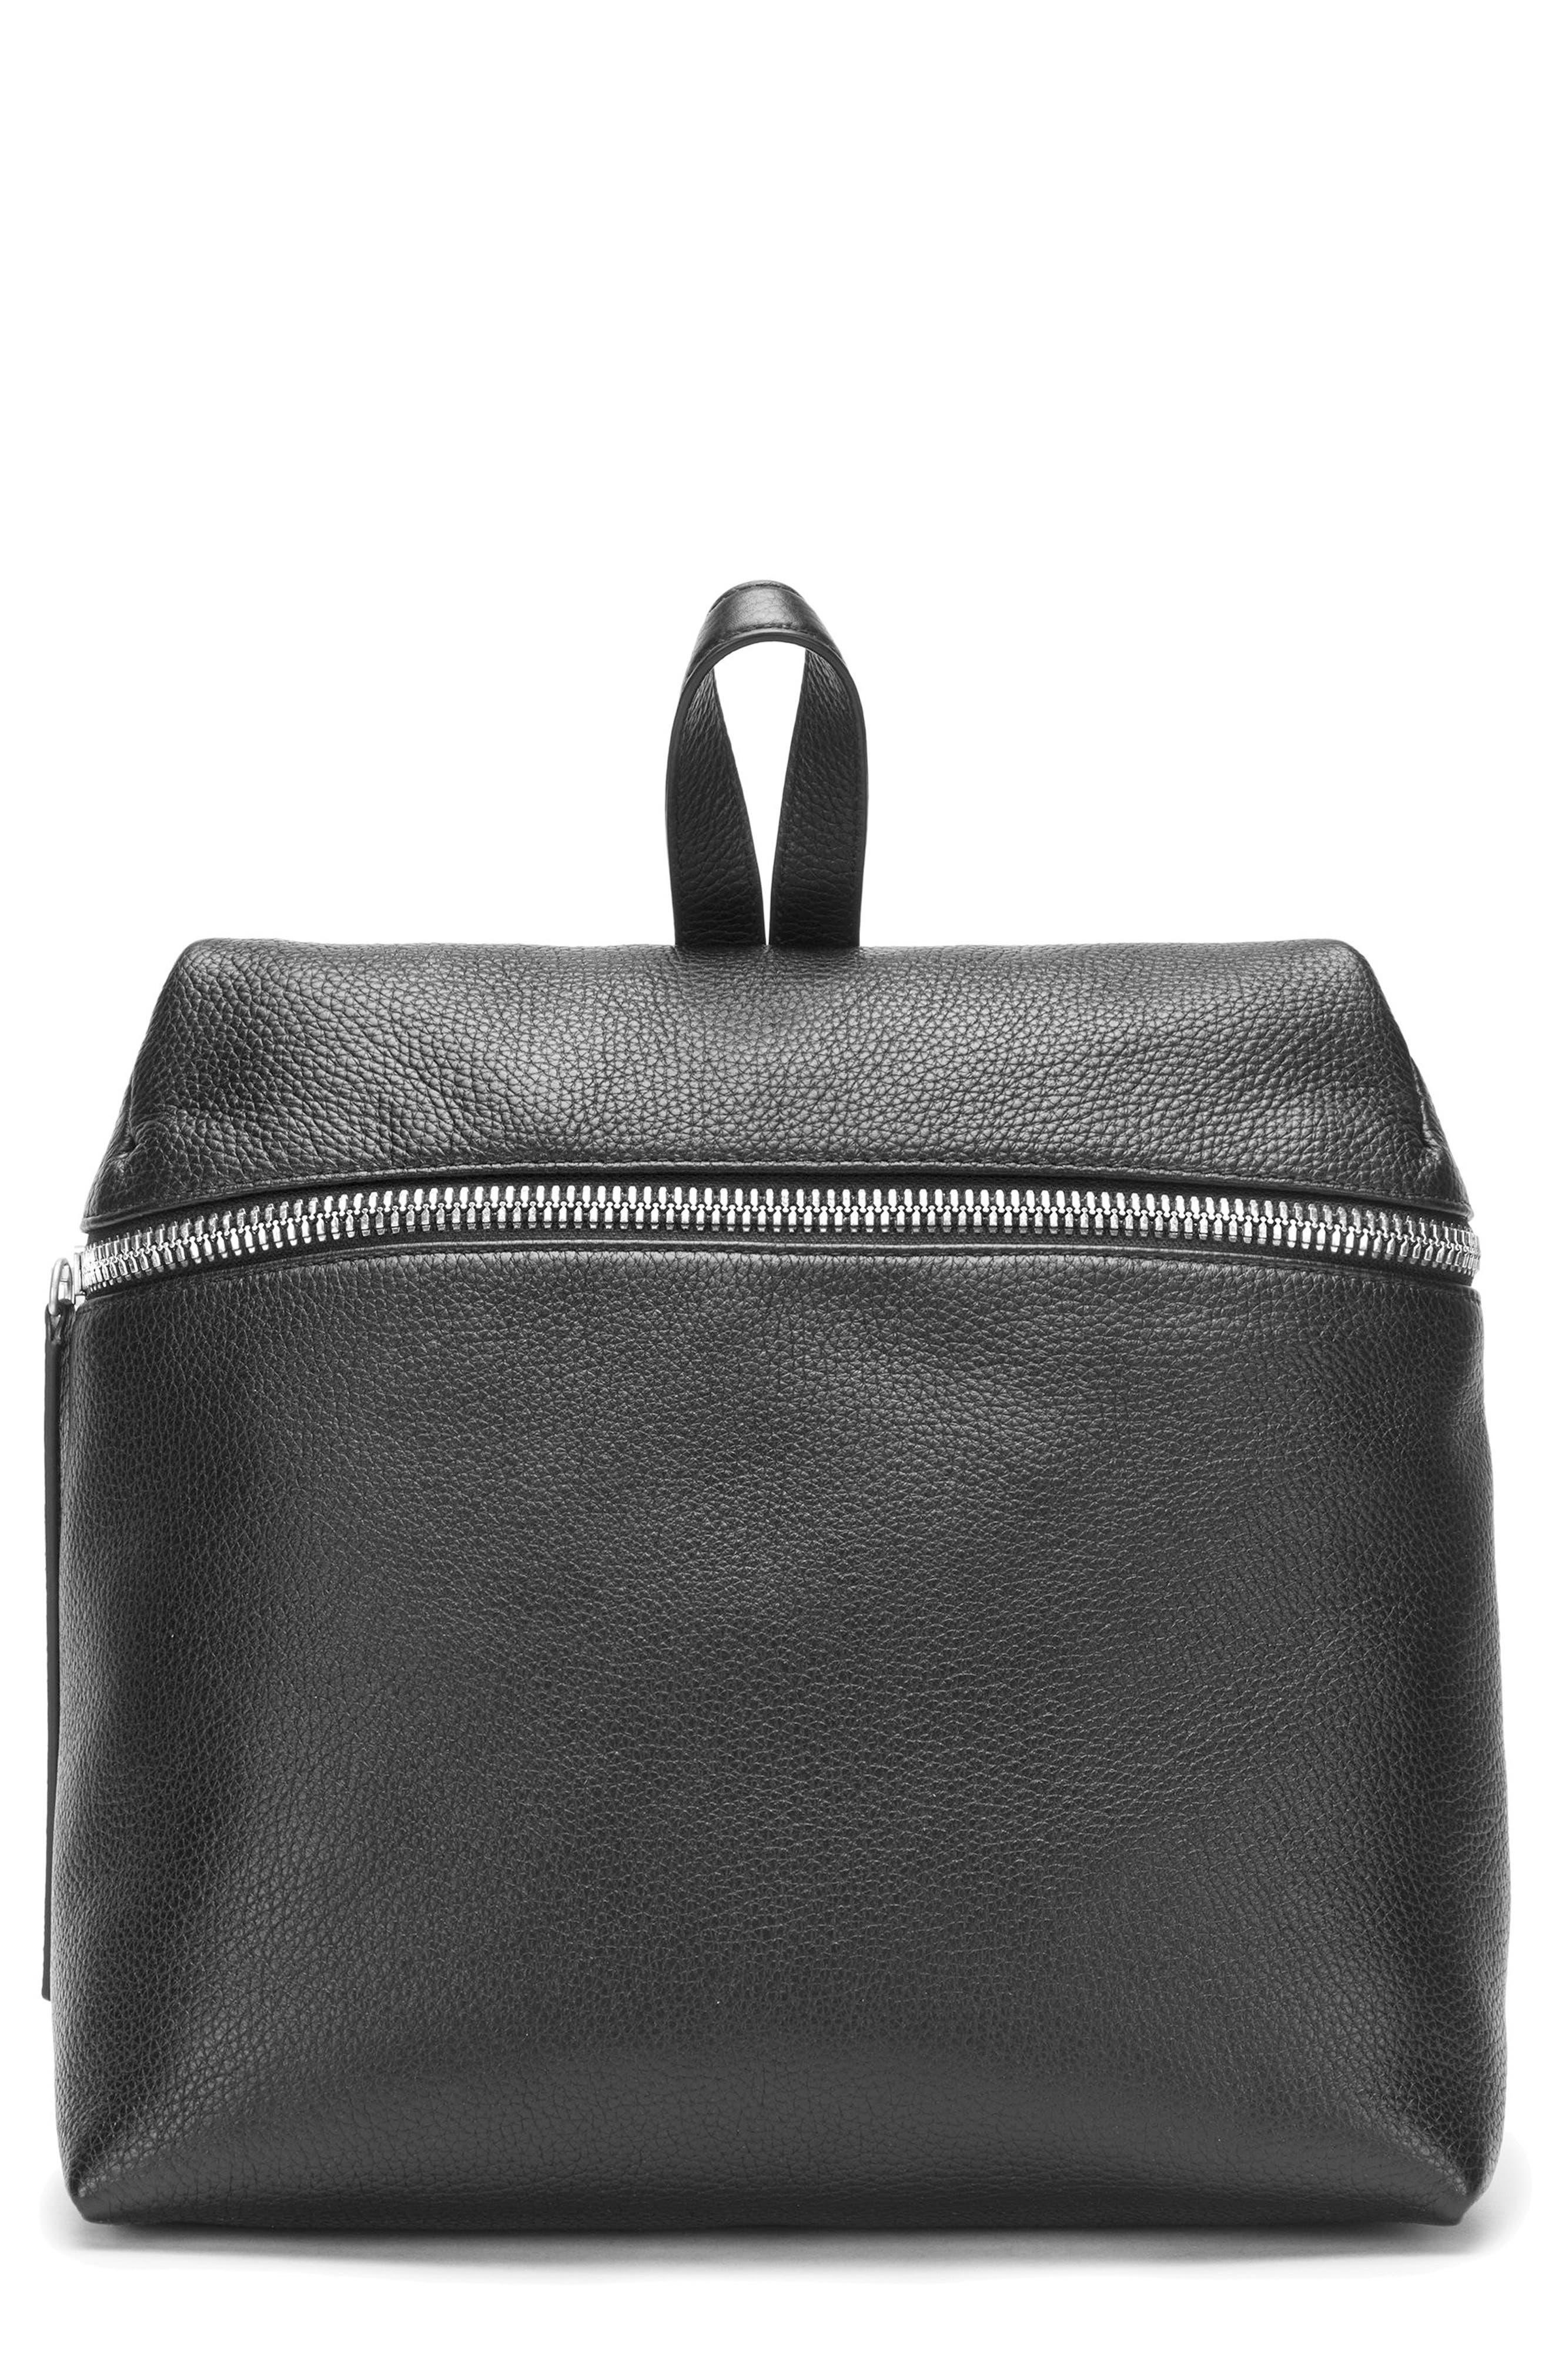 Leather Backpack,                         Main,                         color, BLACK